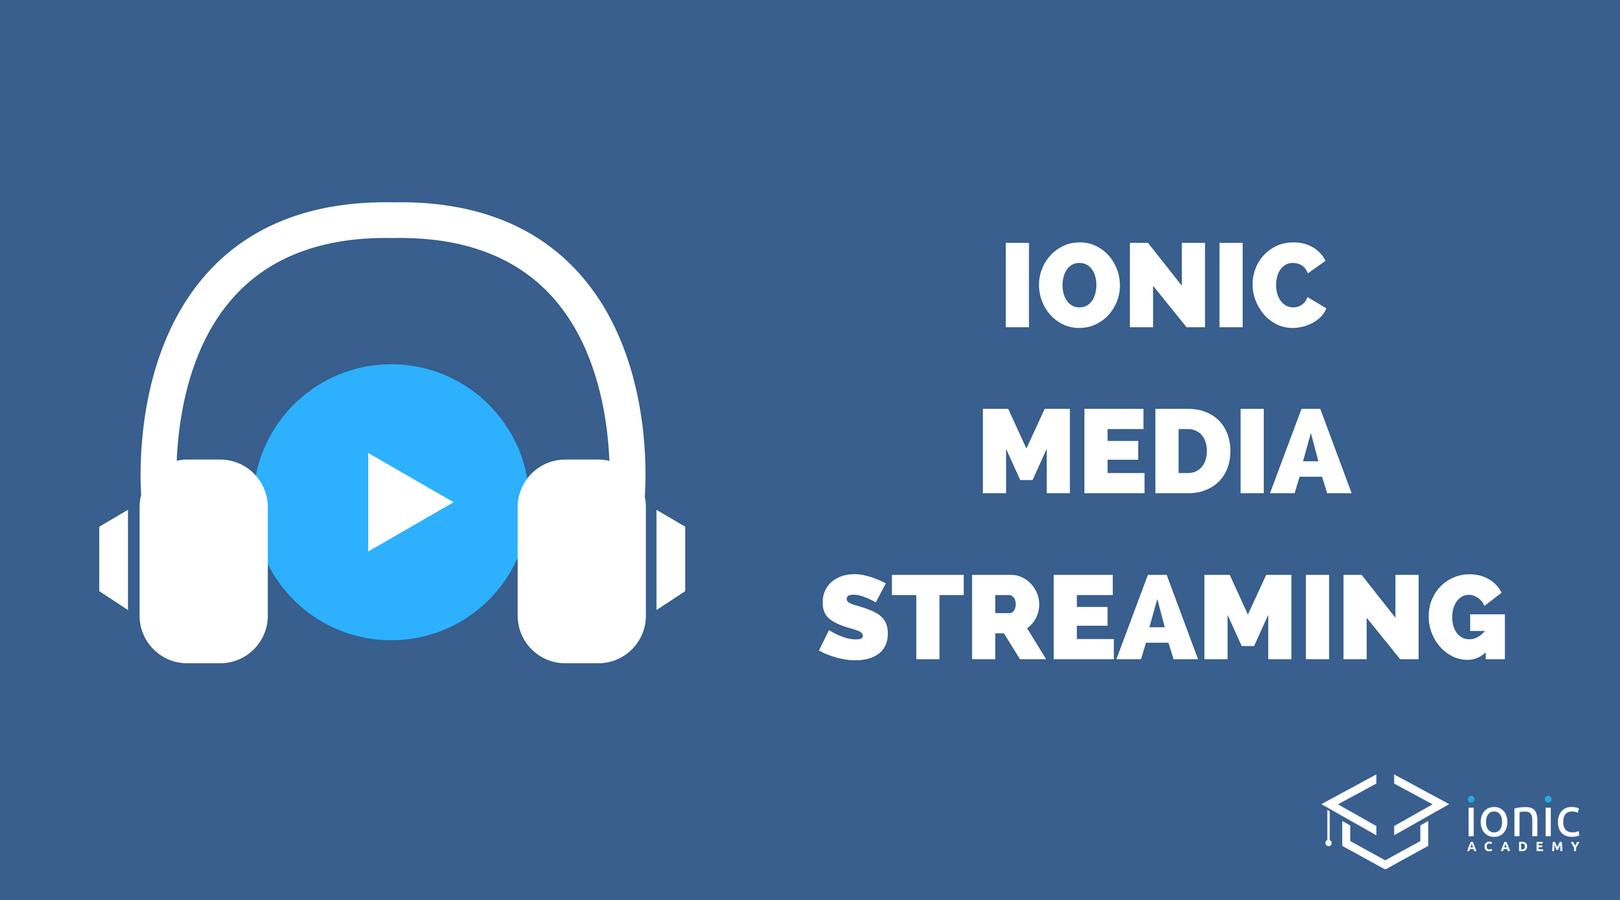 Ionic Media Streaming (Video & Audio) [v3] - Ionic